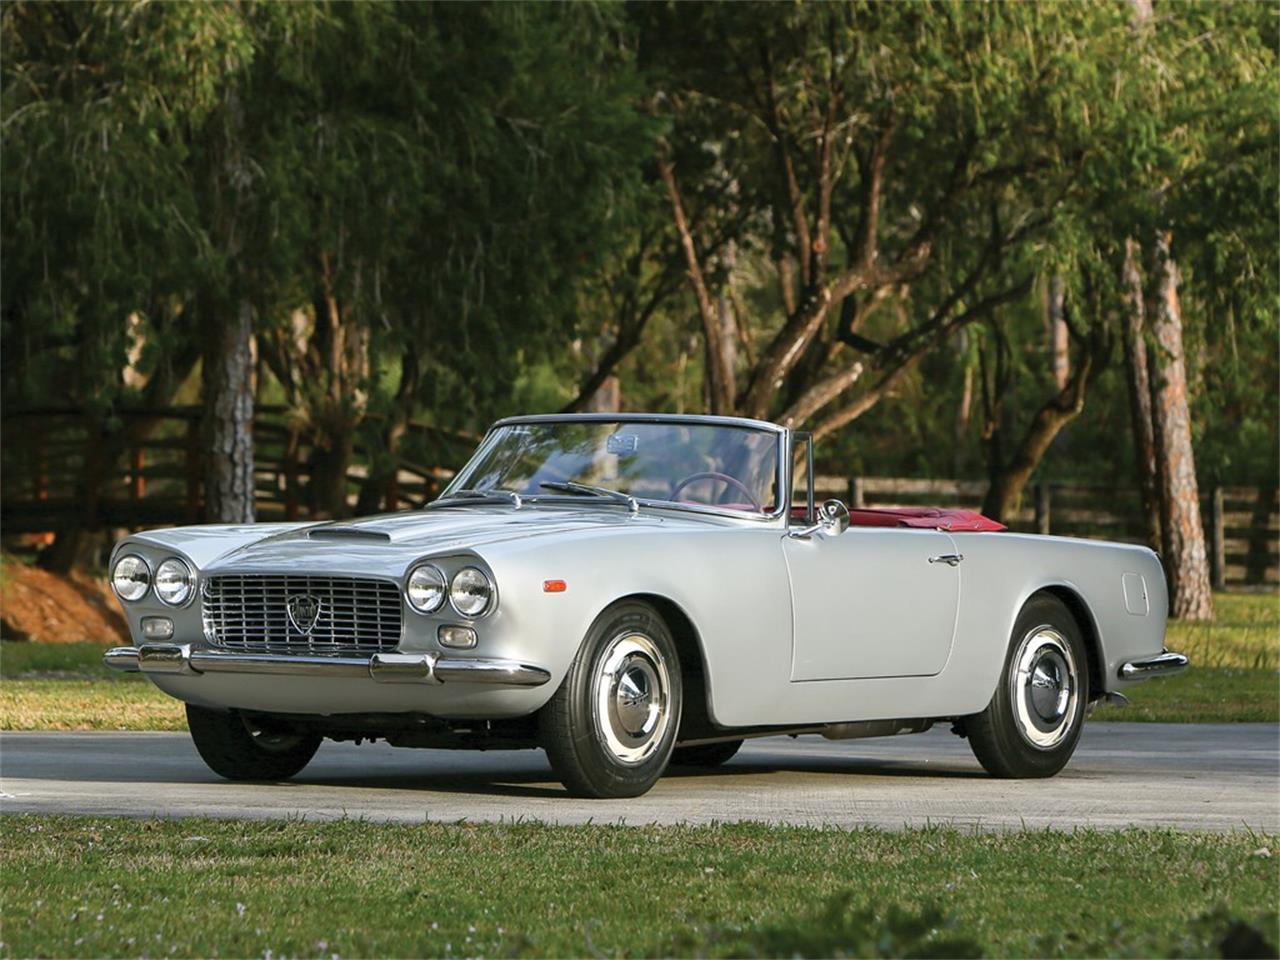 1963 Lancia Flaminia 3C 25 Cabriolet for Sale | ClassicCars